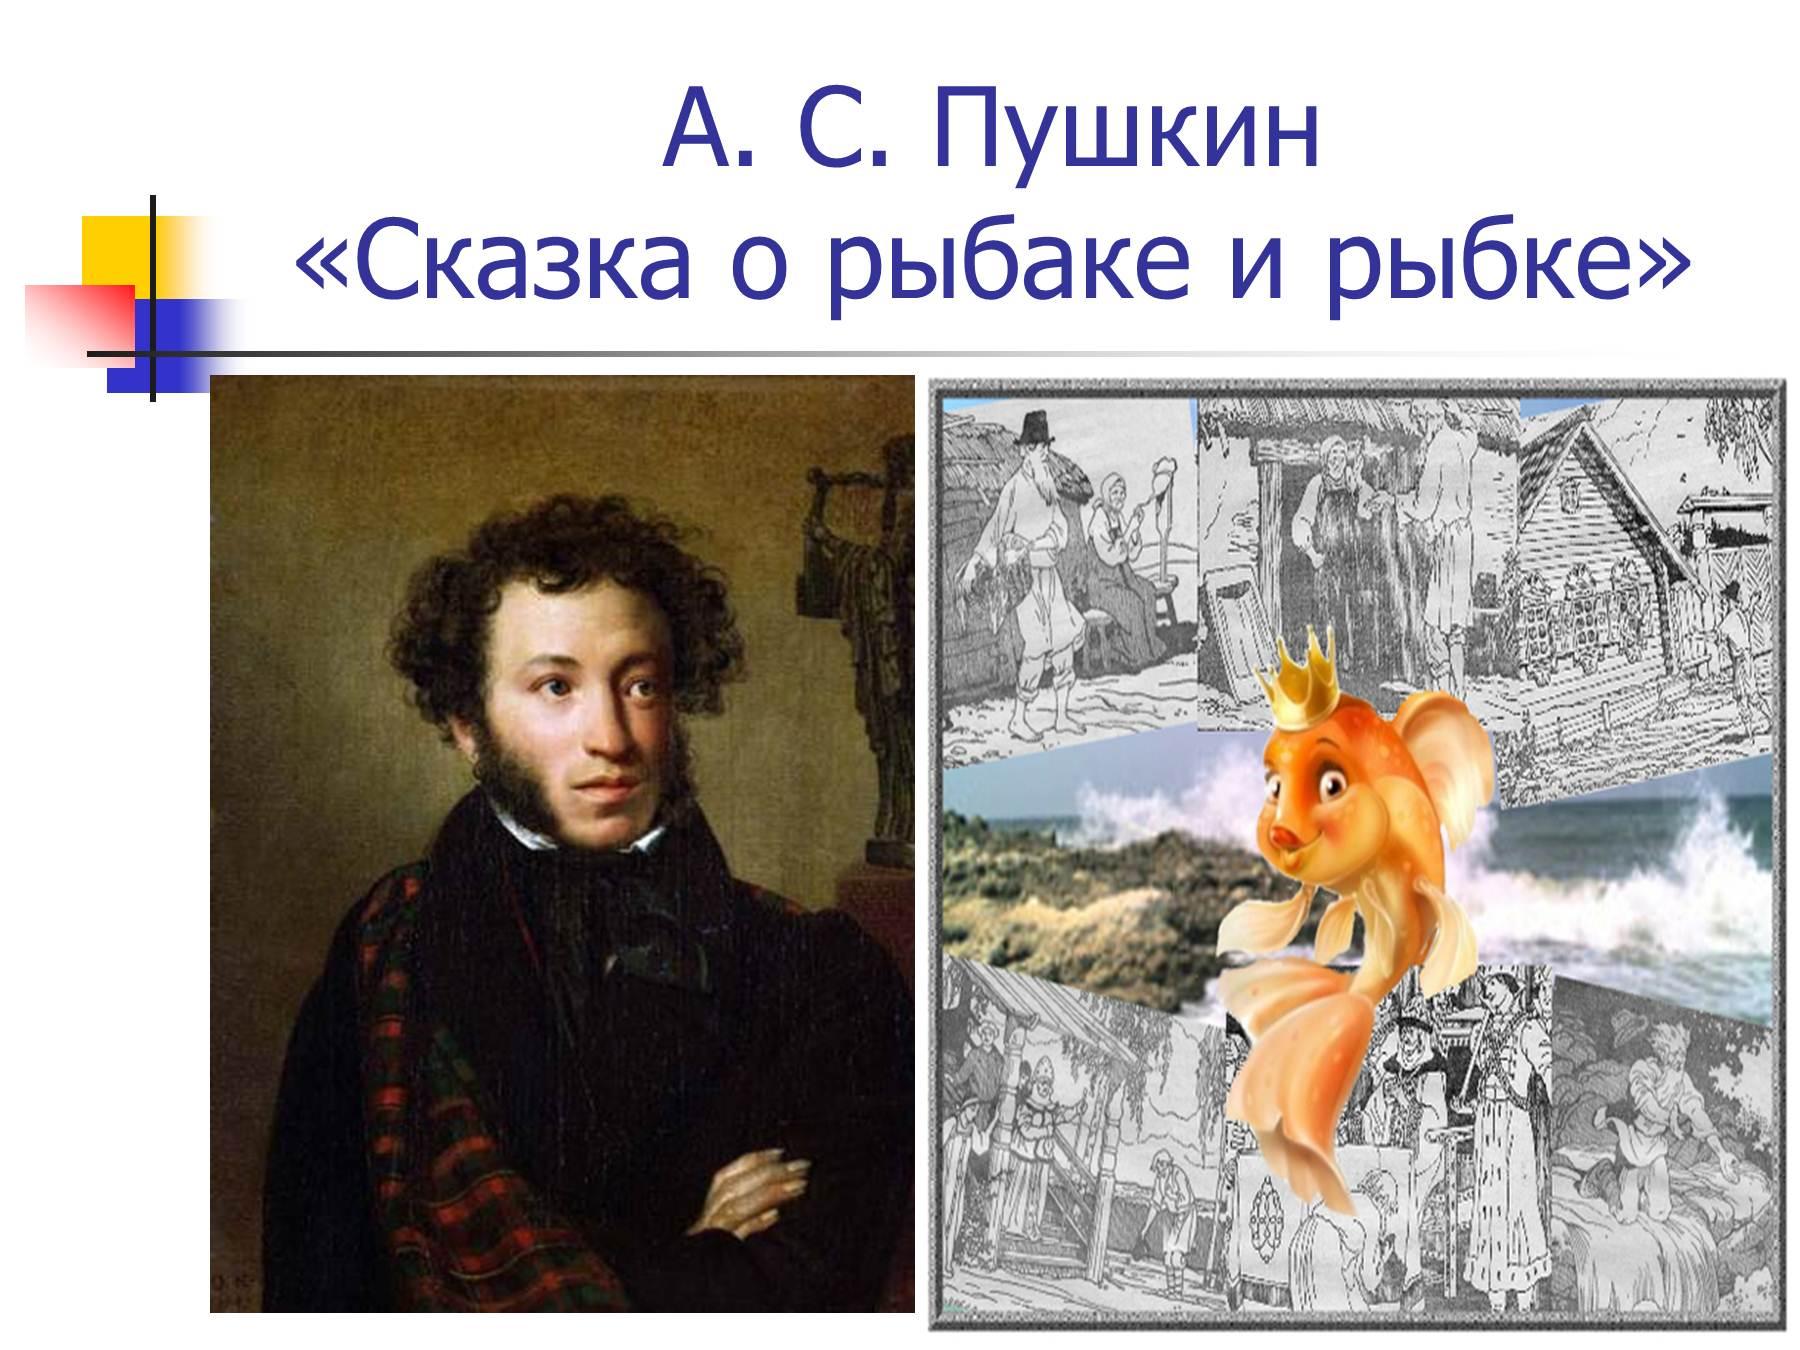 сказка о рыбаке и рыбке пушкина и братьев гримм